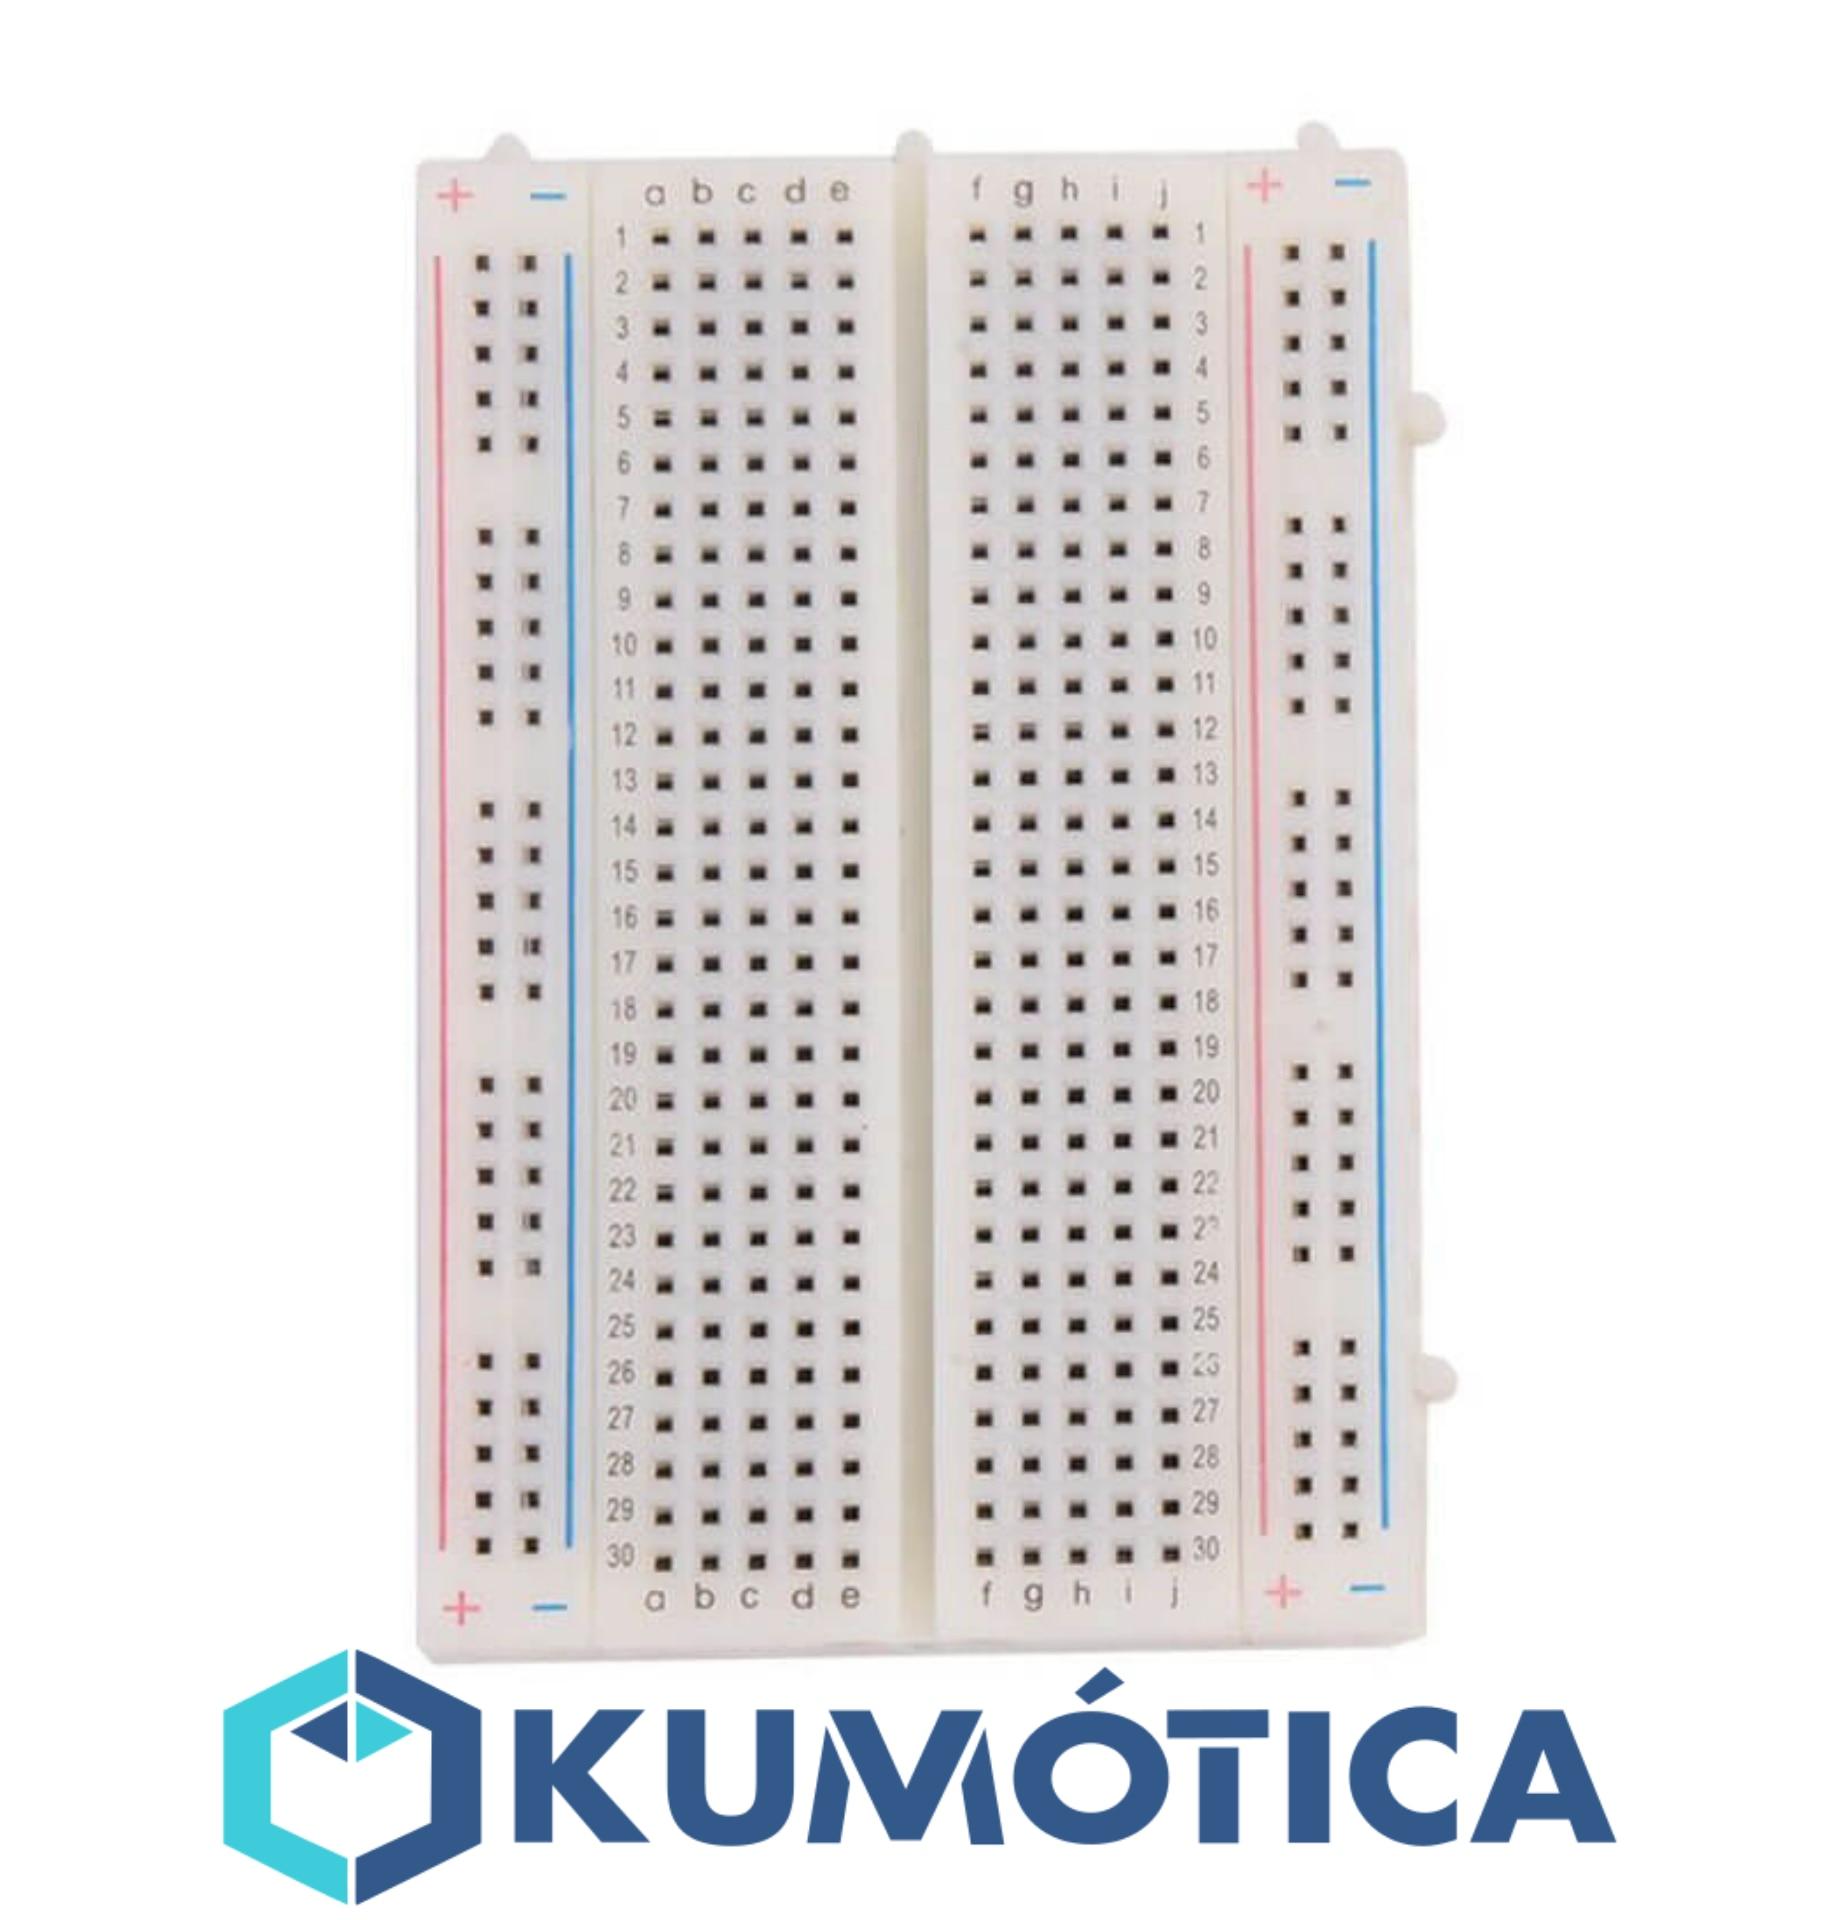 Breadboard Breadboard 400 Pin, Connection Board For Arduino Projects/Rasperri Pi